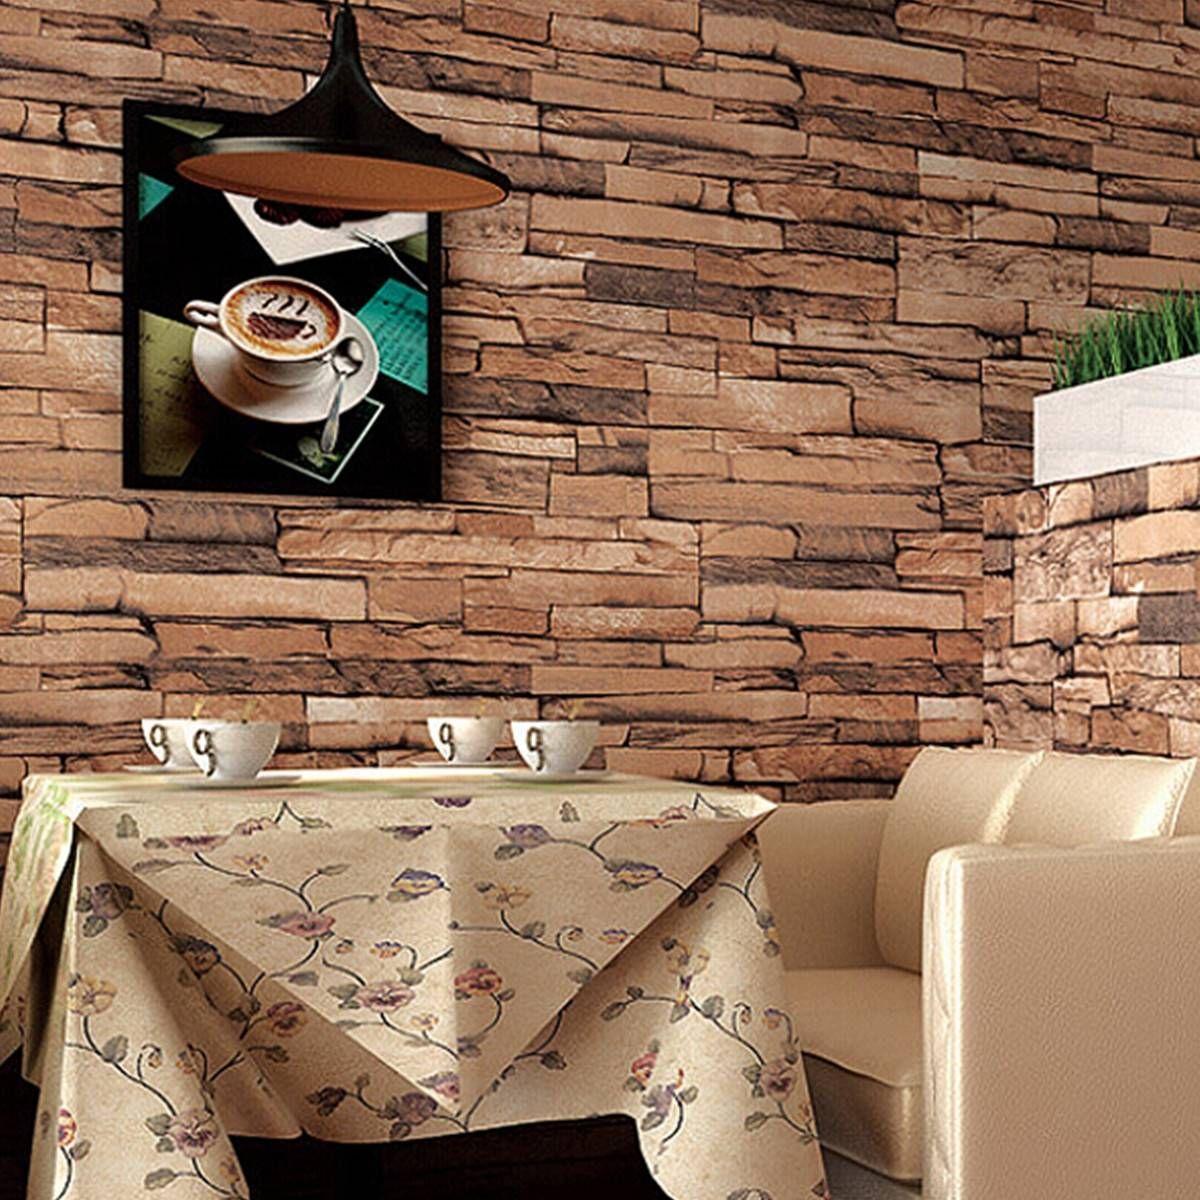 10M 3D Wallpaper Roll PVC Brick Grain Waterproof Wallpaper